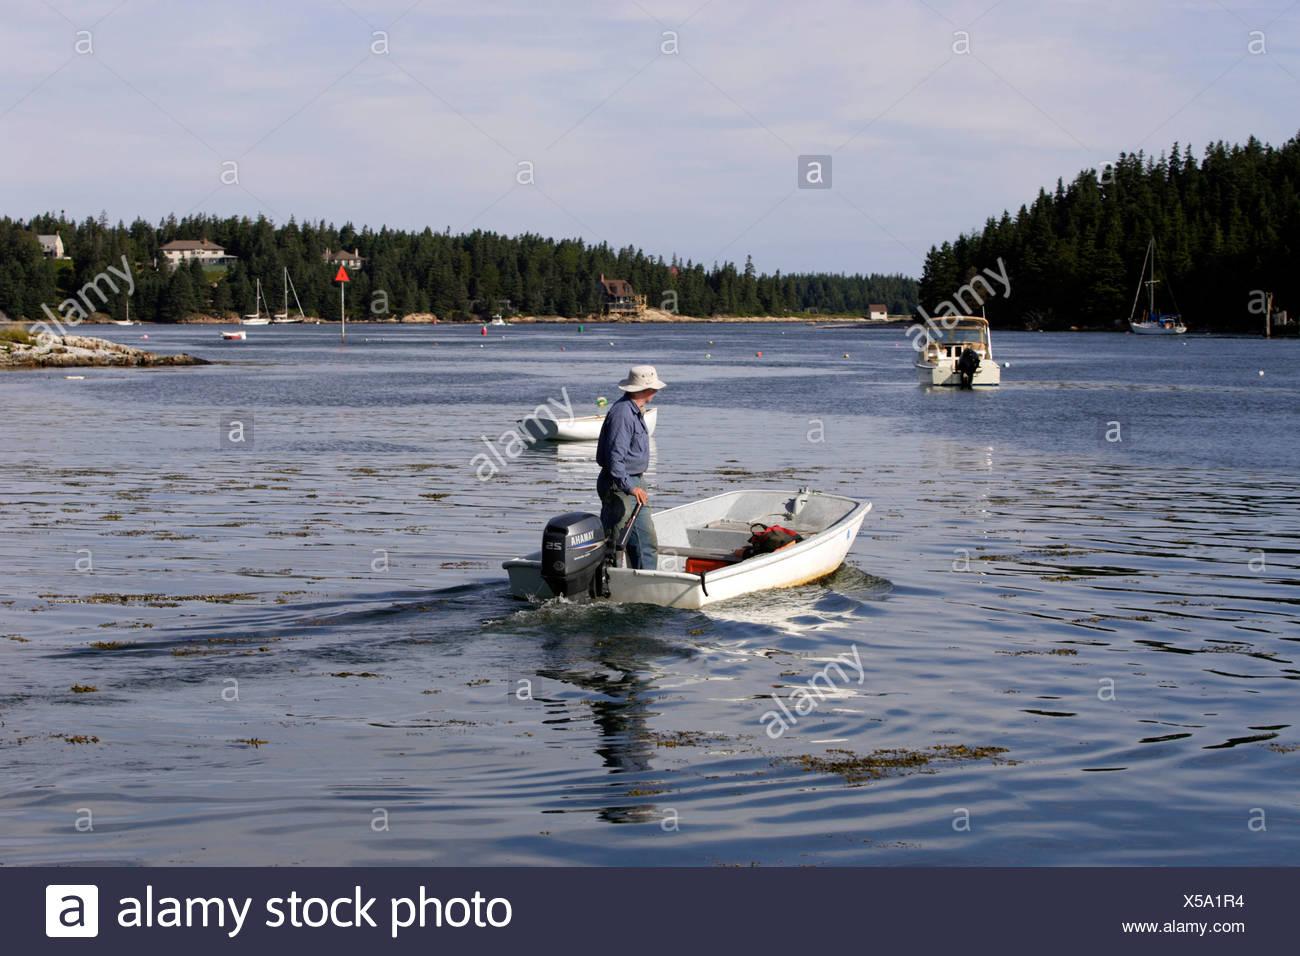 Man in dinghy, Isle au Haut, Arcadia National Park, Maine coast, New England, USA Stock Photo